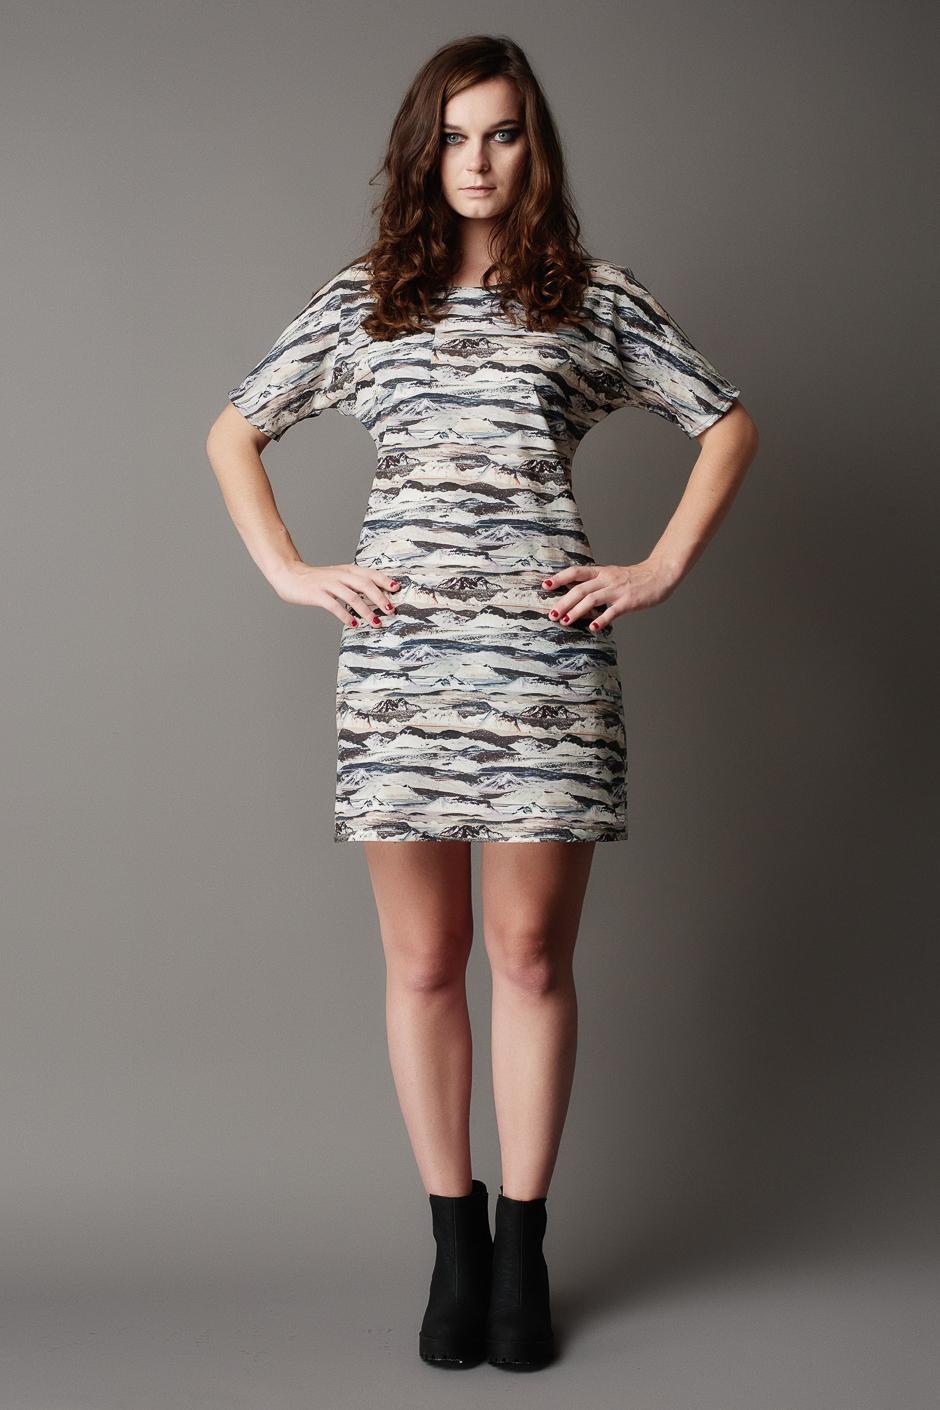 Aurum Dress from Deer & Doe